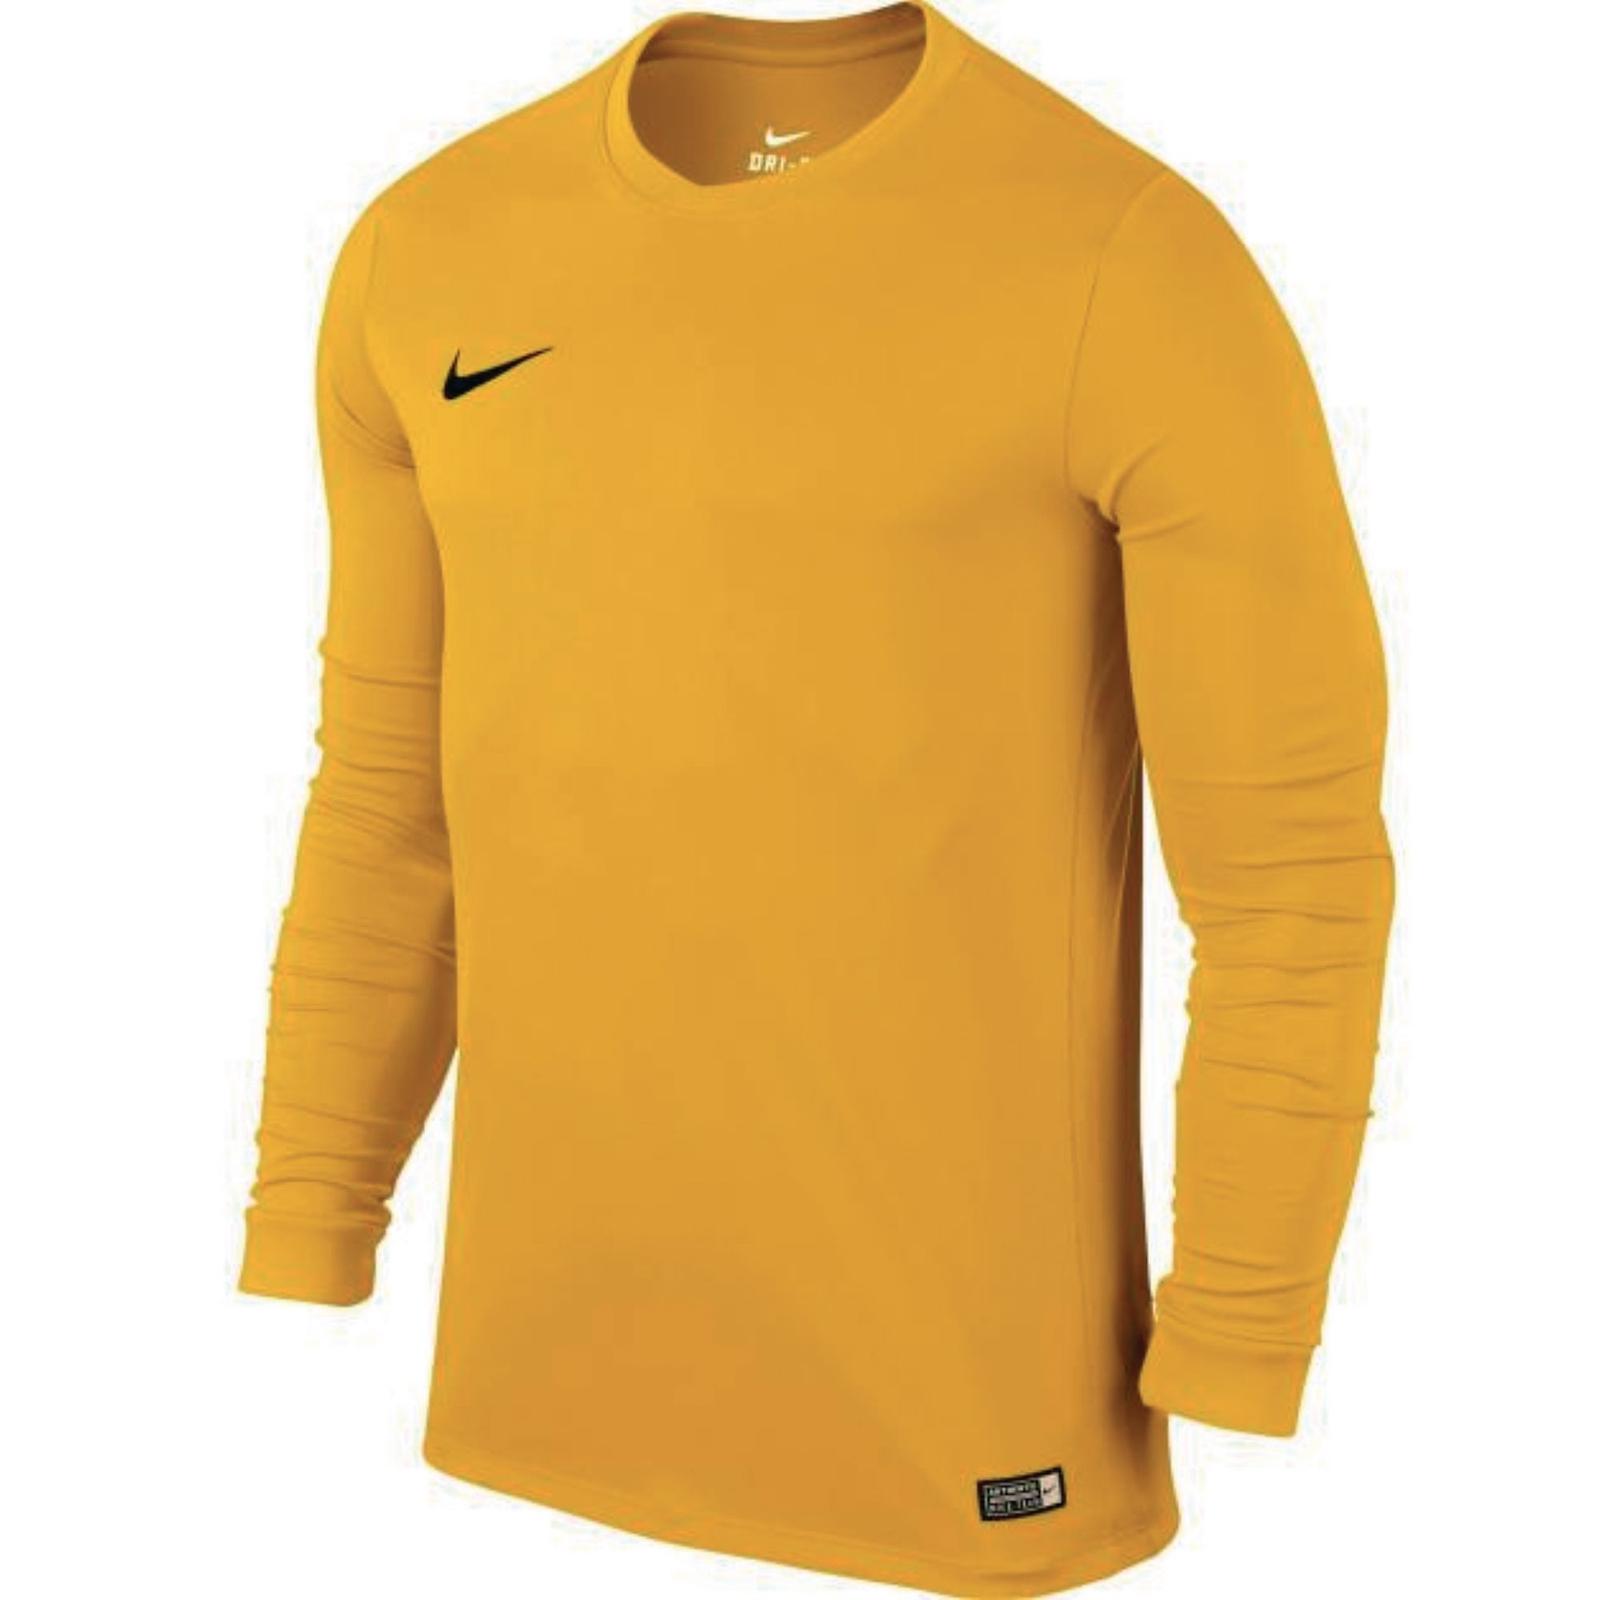 Nike Park Long Sleeve Football Shirt University Gold 32-35  1d551c3db